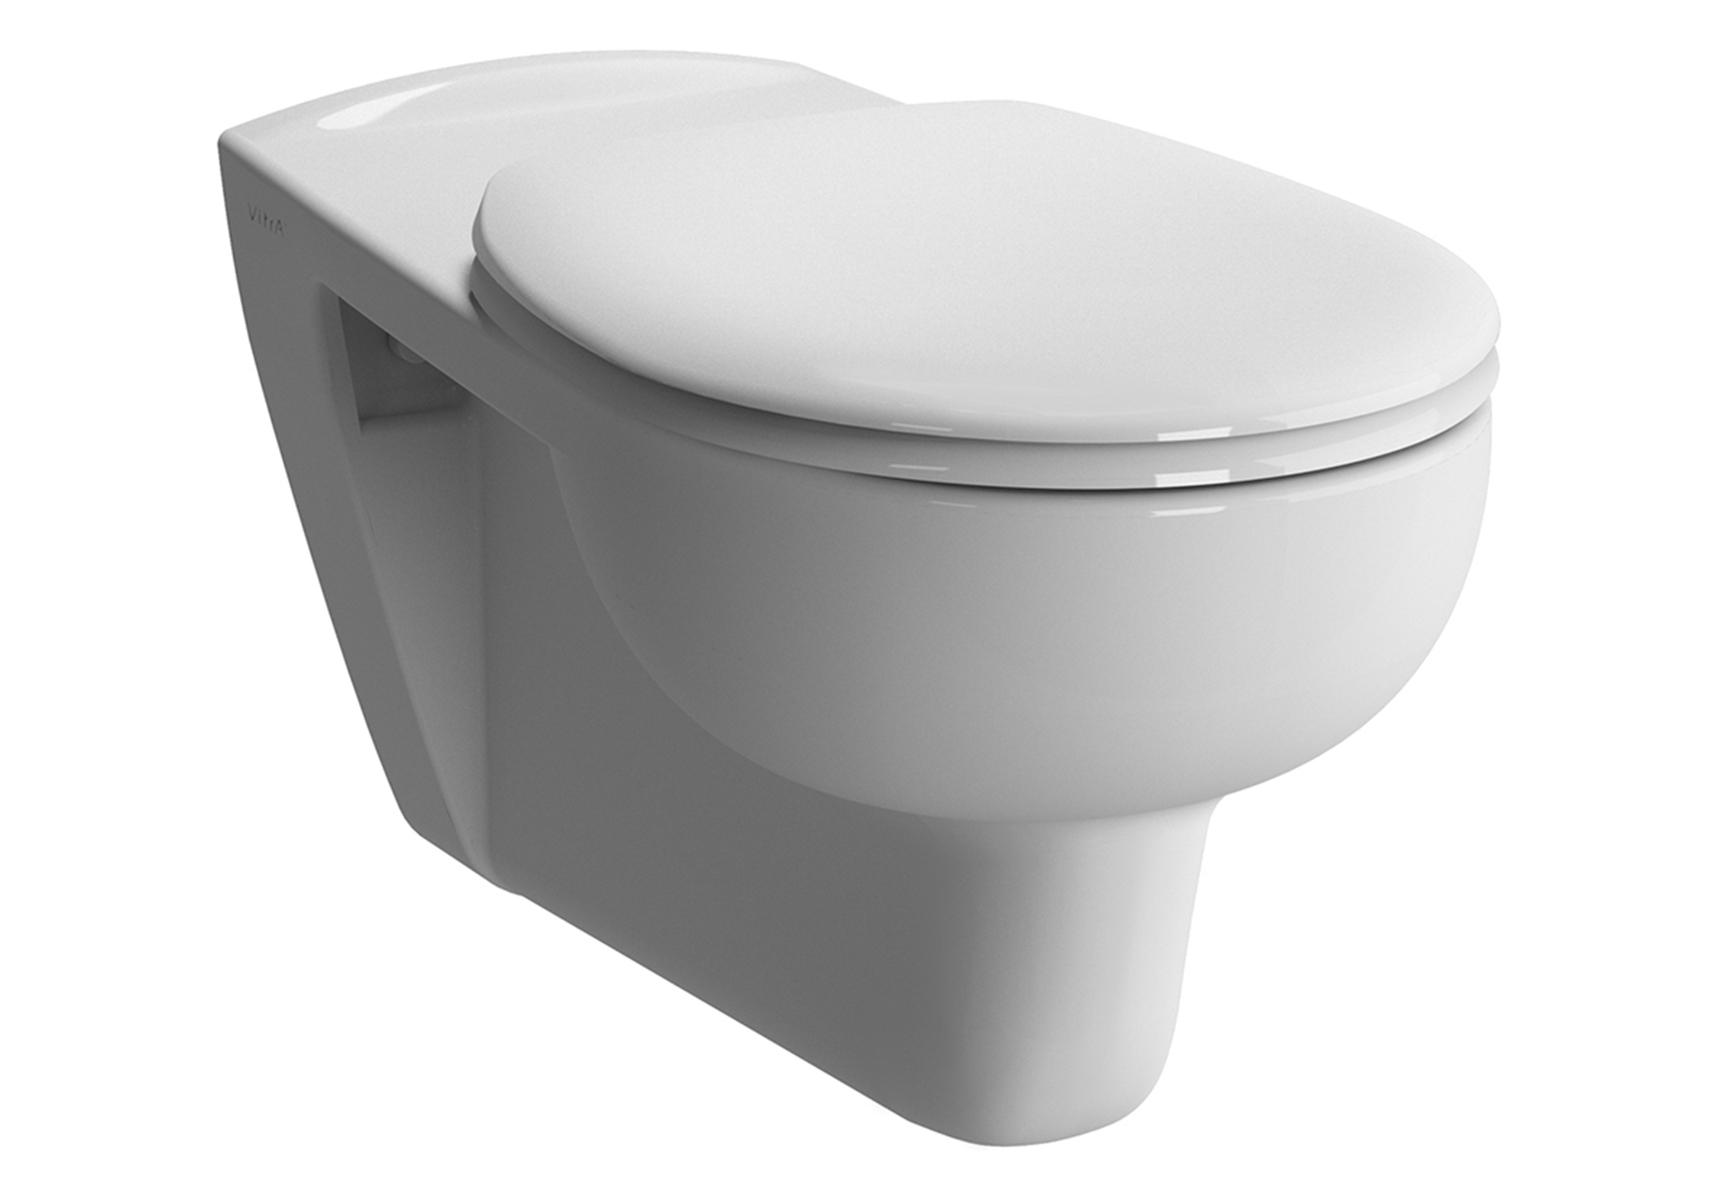 Conforma Wand-WC Tiefpüler, 70 cm